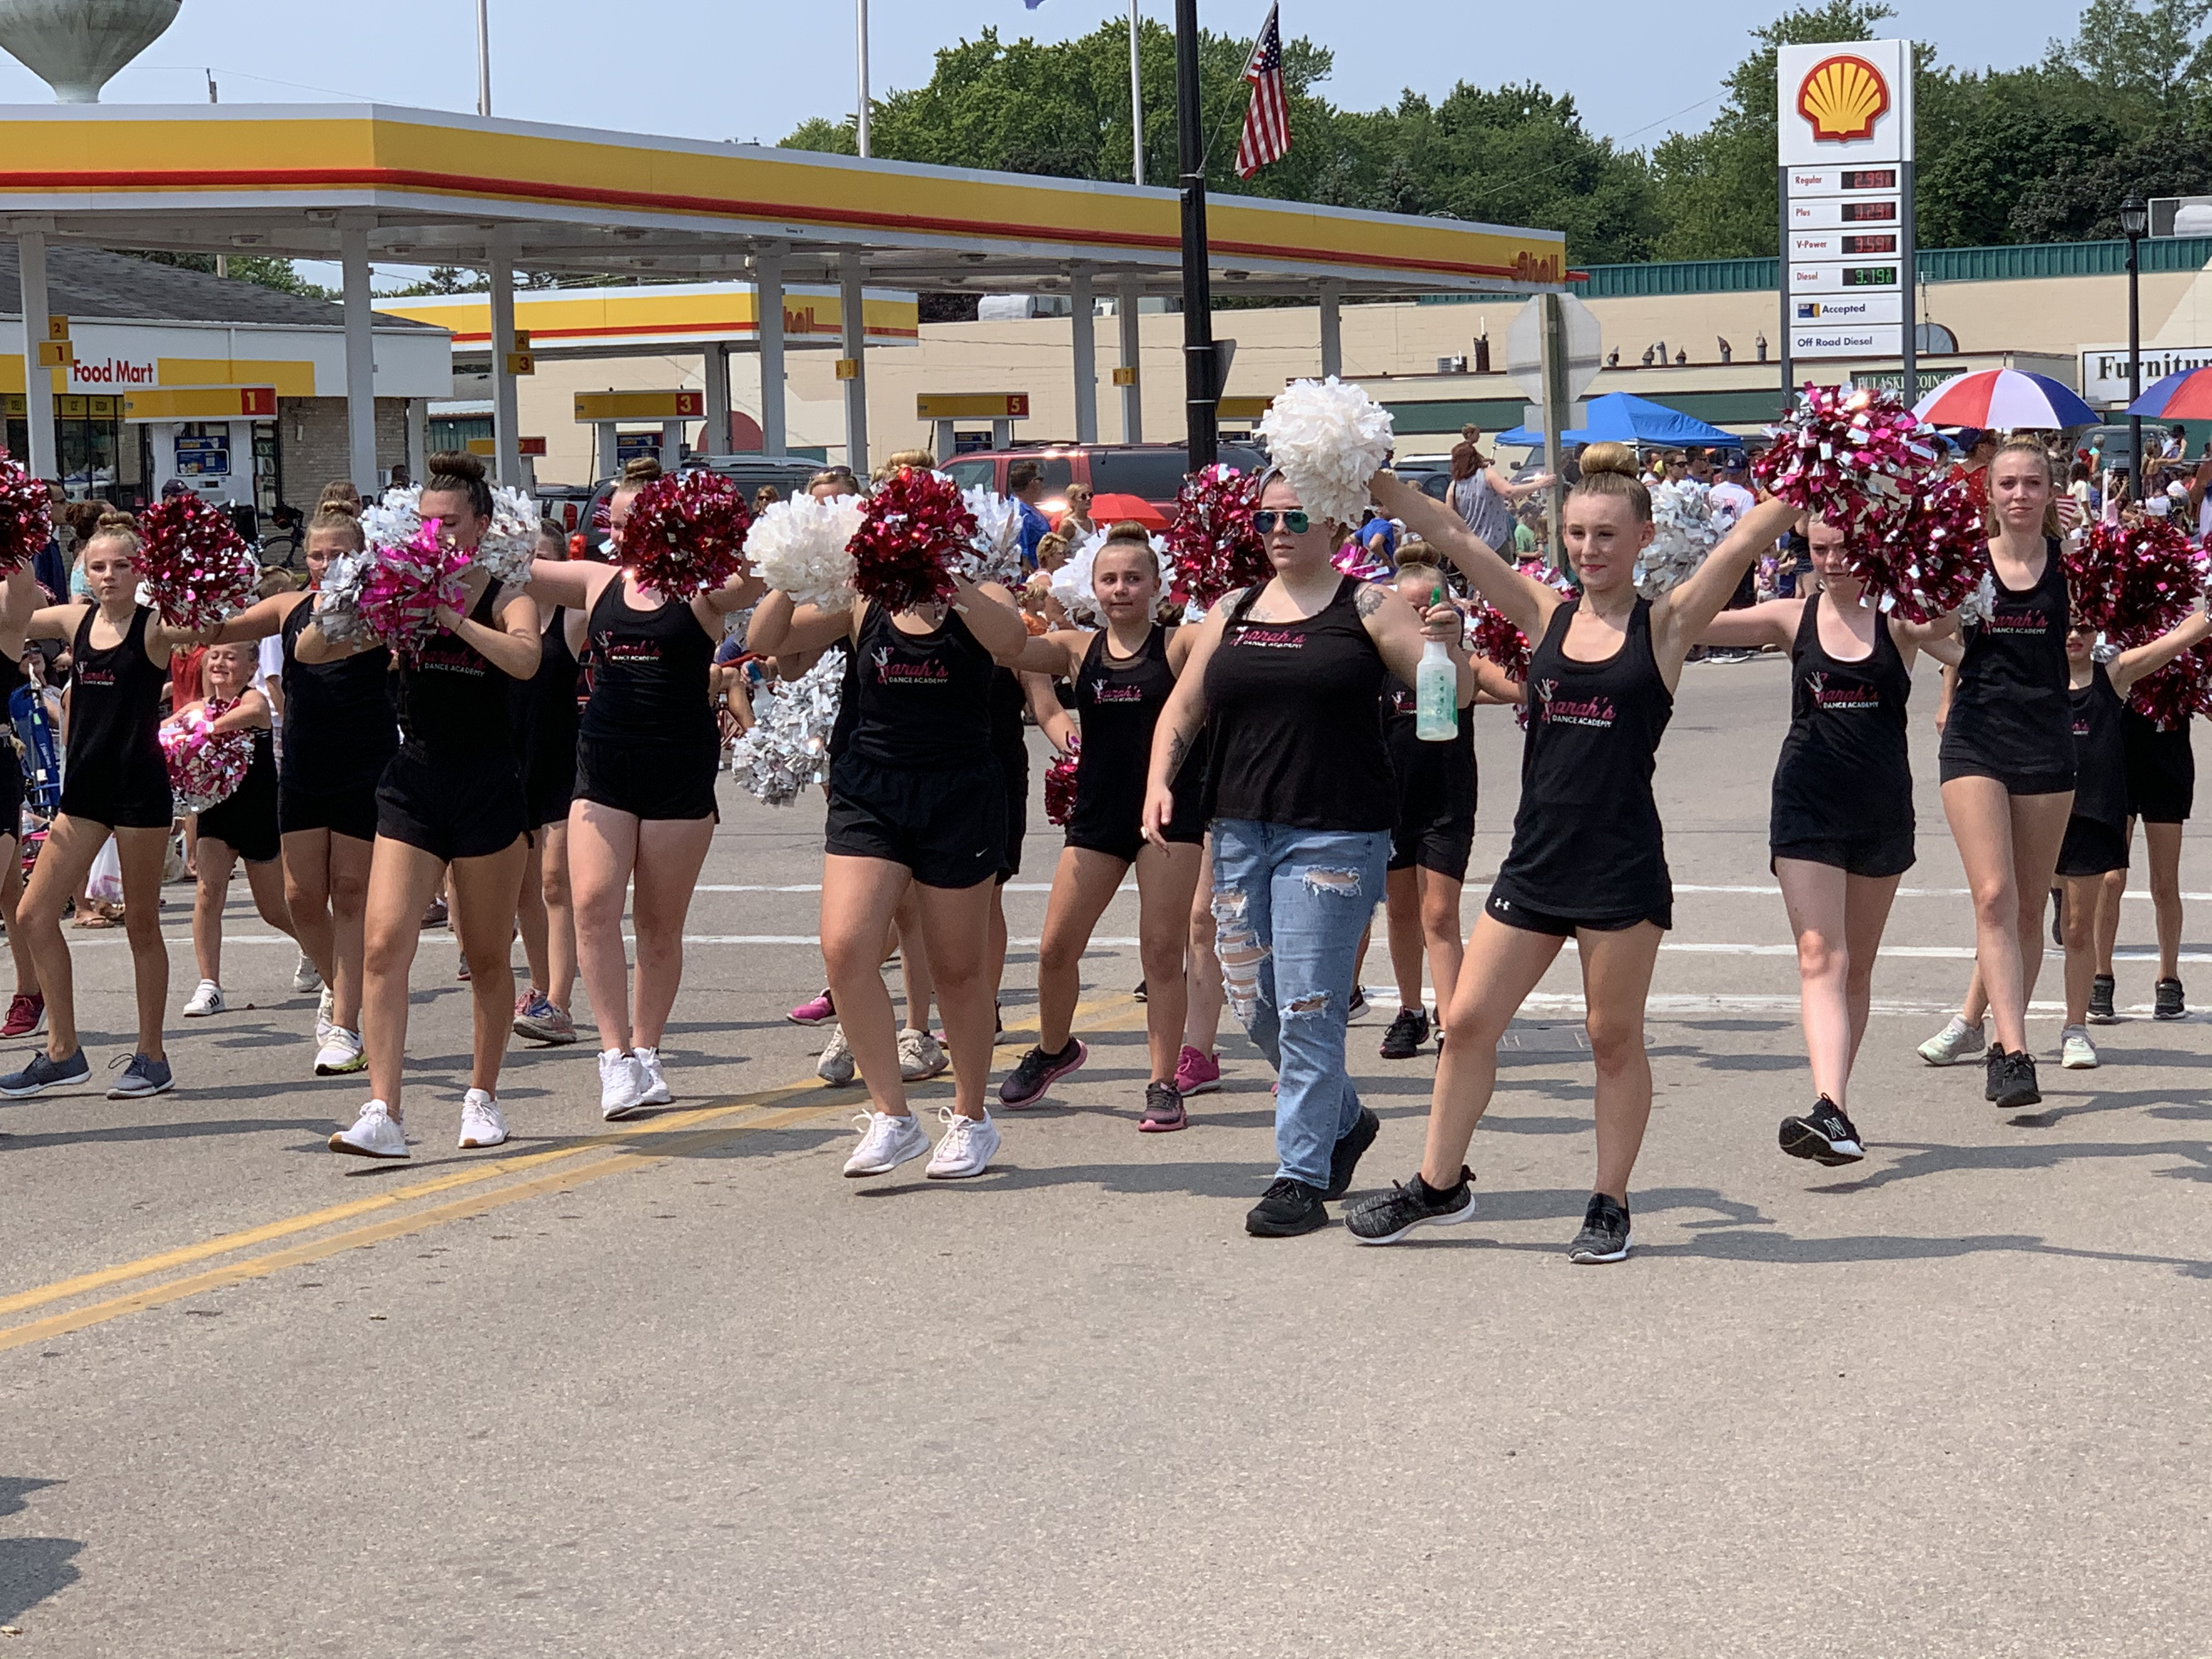 Members of Sarah's Dance Academy perform dances with their pom-poms as they walk down Pulaski Street on July 18.Luke Reimer   NEW Media